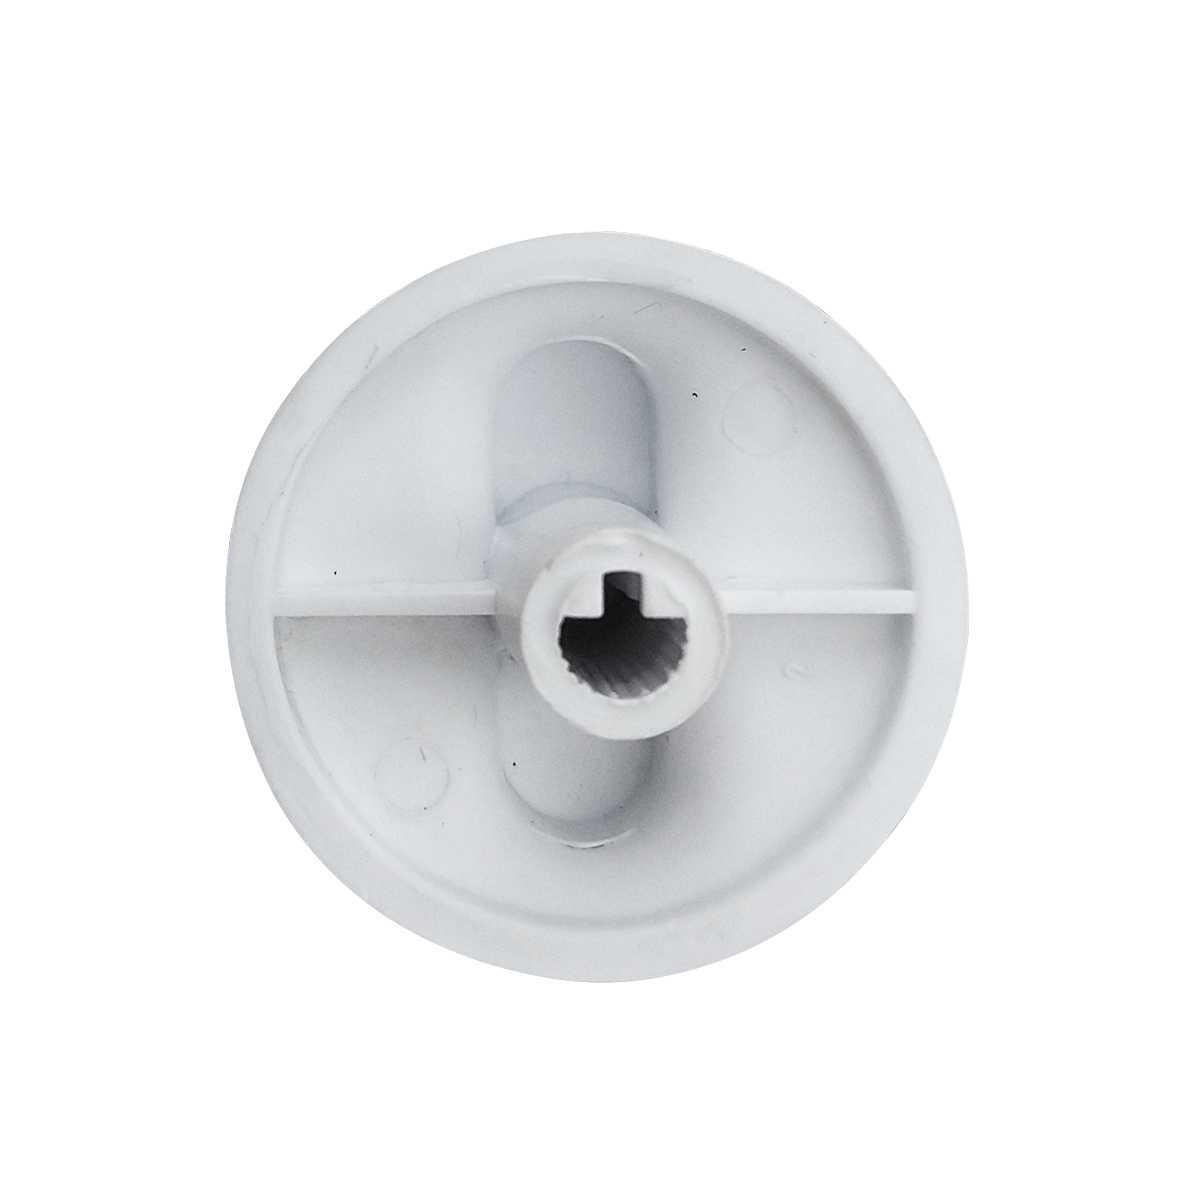 Botão termostato geladeira Brastemp 326044251